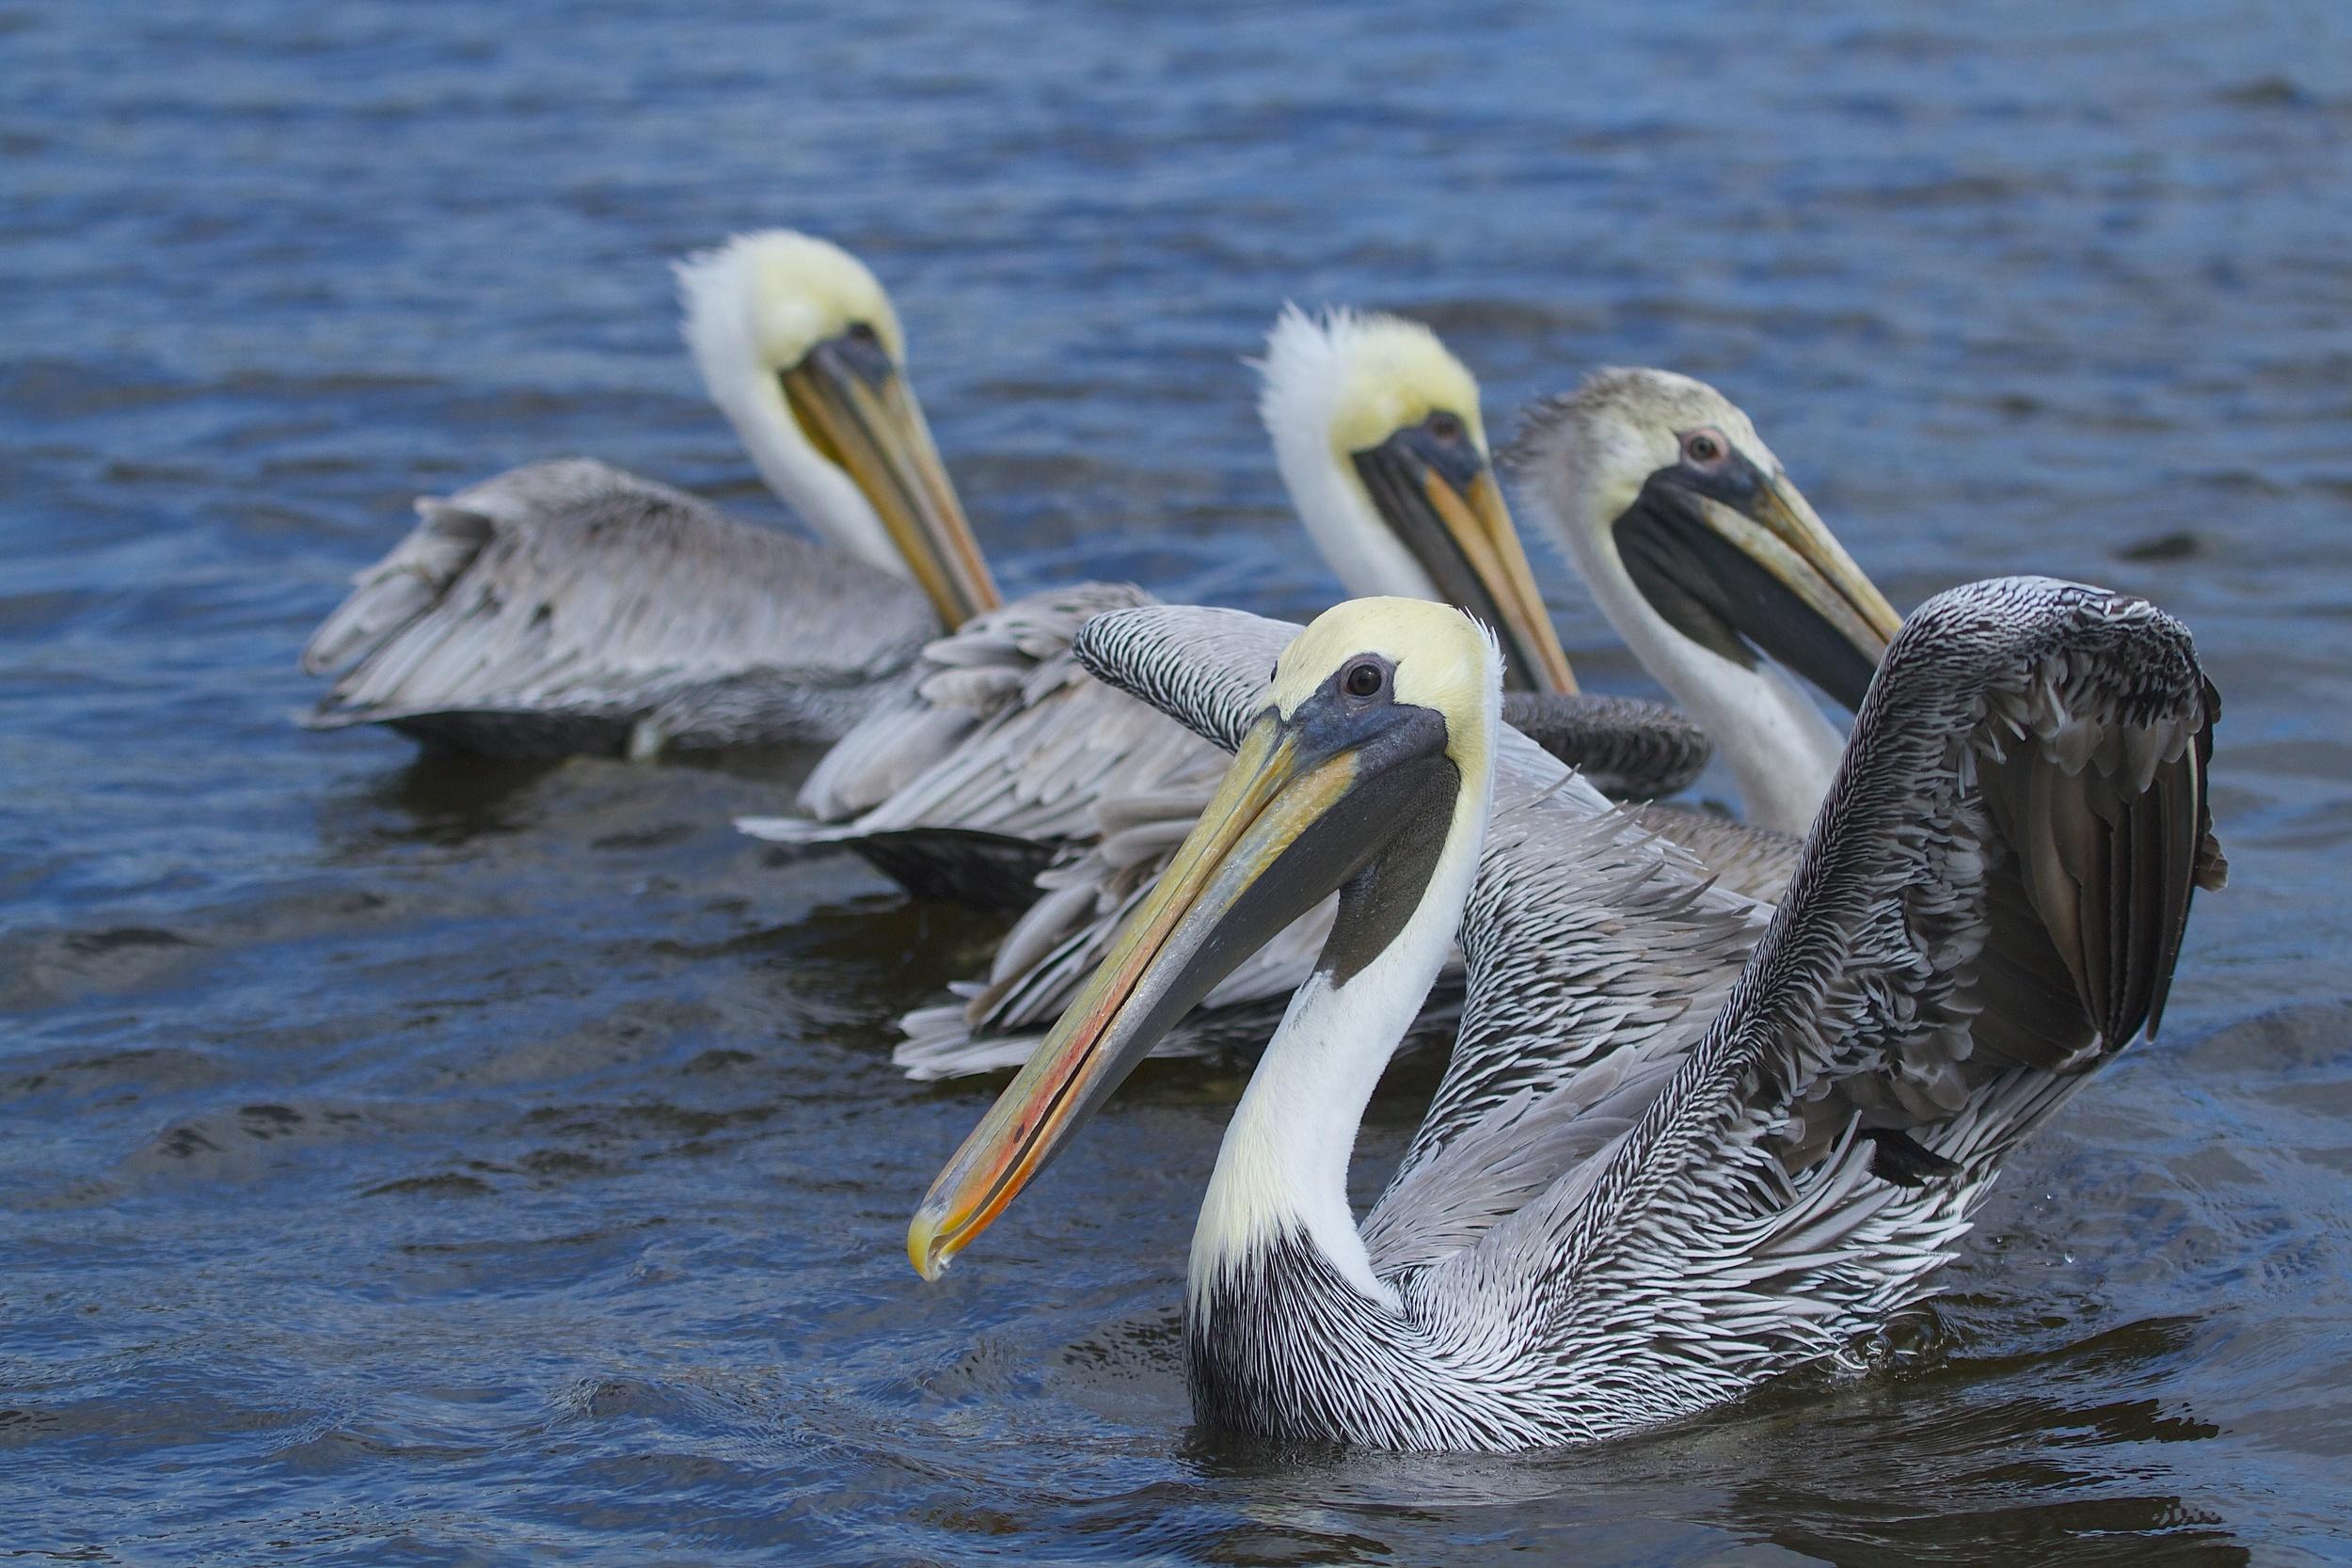 Eager beaks await some spare bait fish.